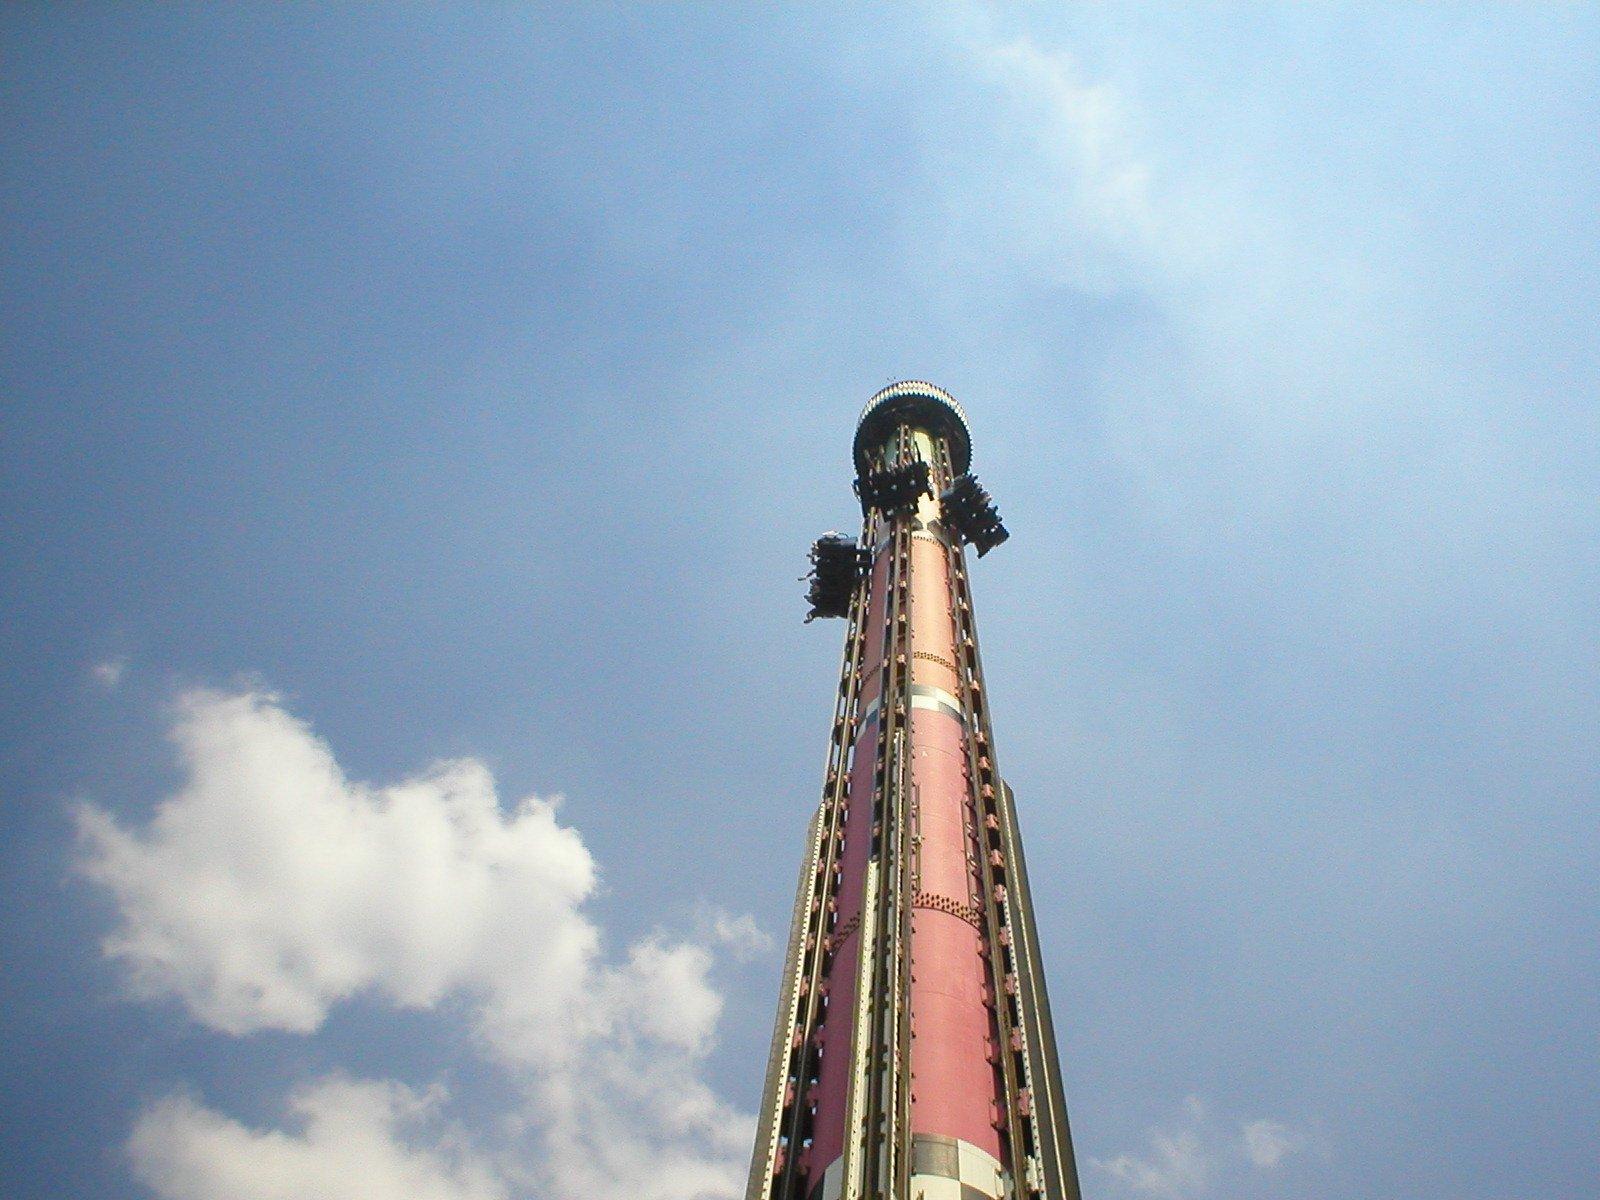 File:PCW Drop Tower 2005.jpg - Wikimedia Commons